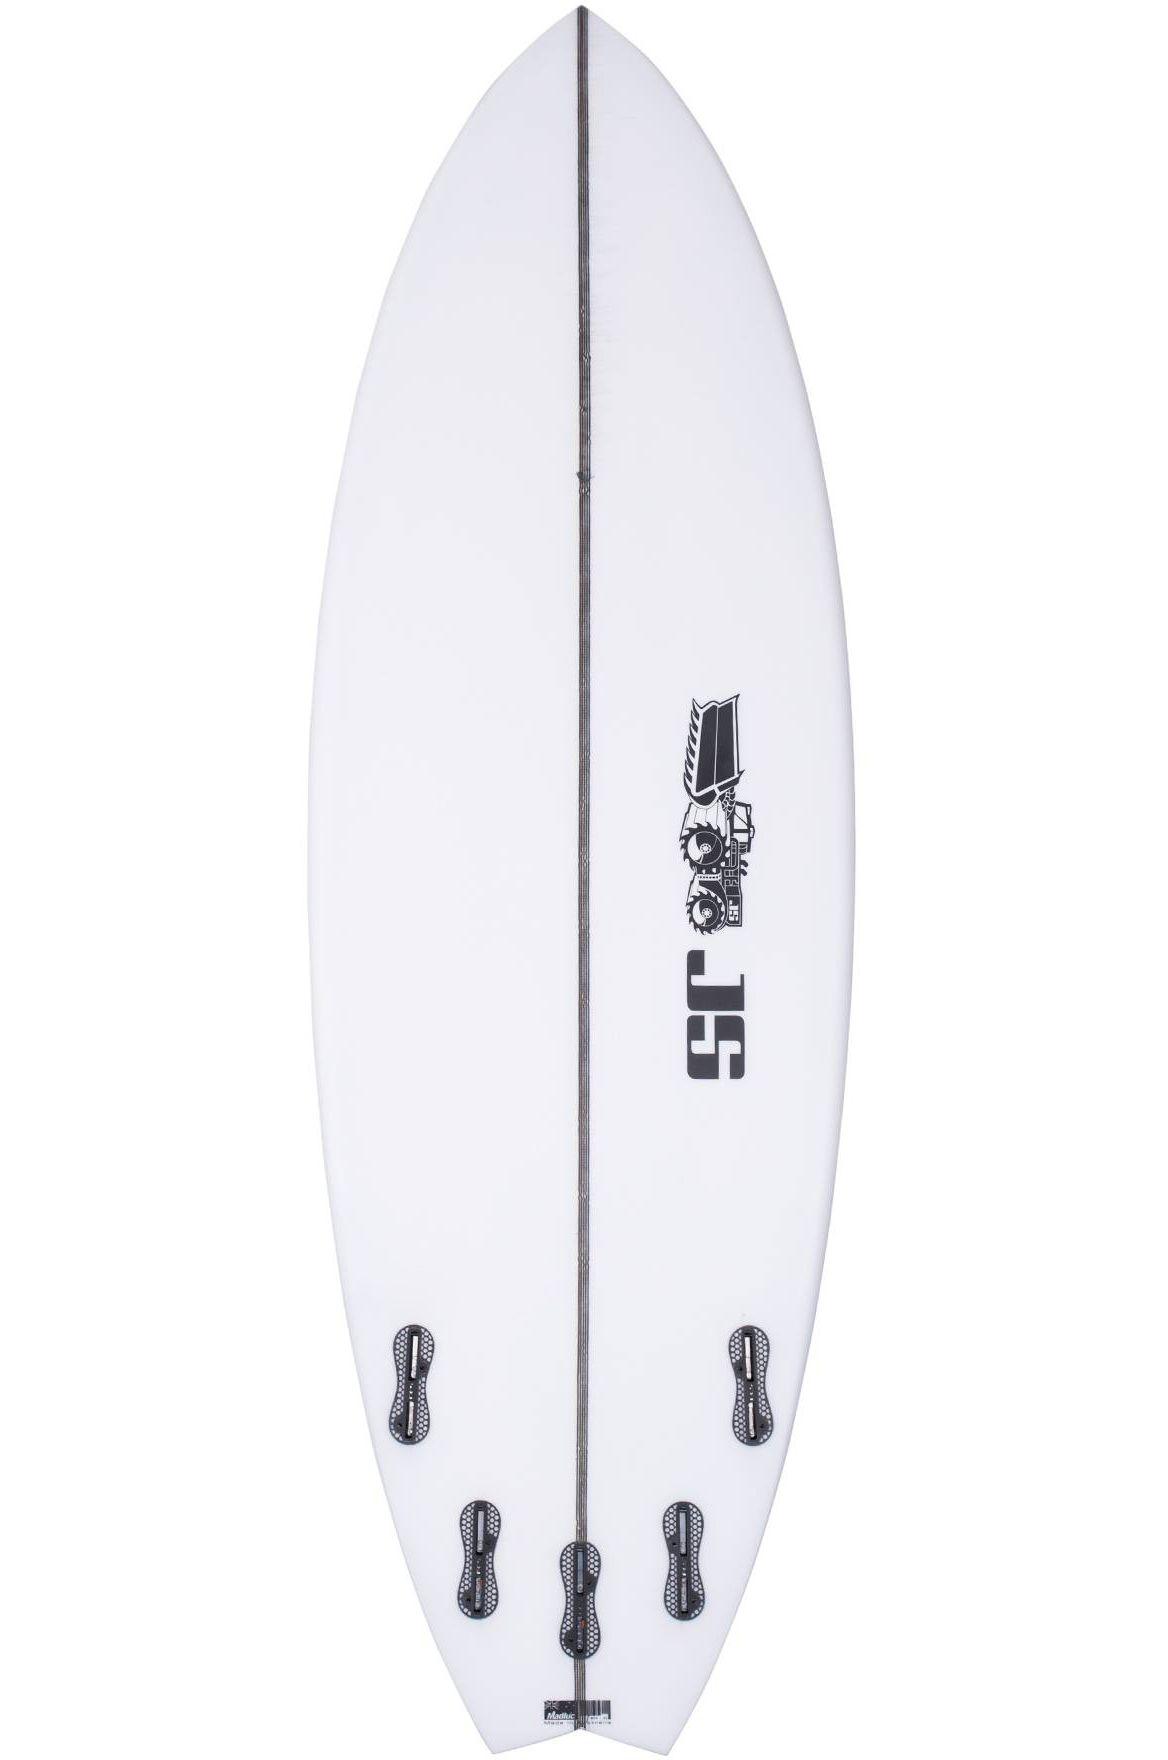 Prancha Surf JS PSYCHO NITRO 5'7 Swallow Tail - White FCS II Multisystem 5ft7